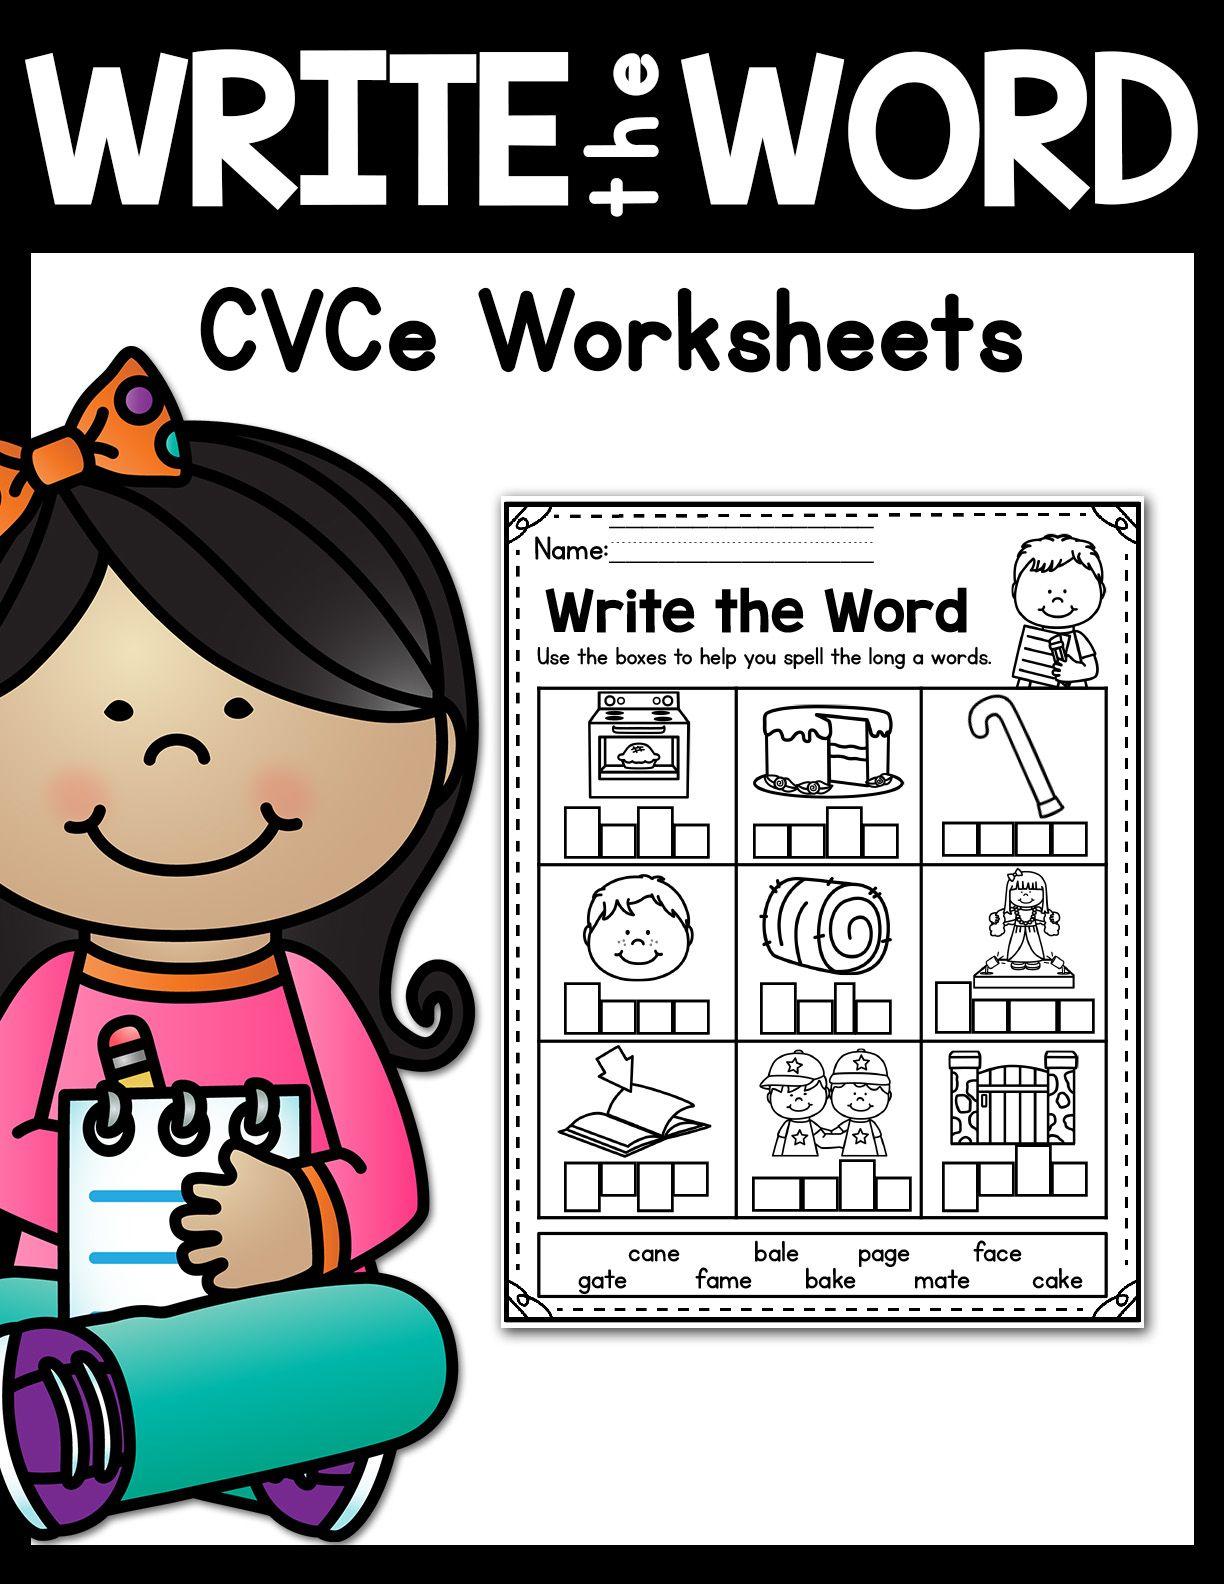 Cvce Worksheets